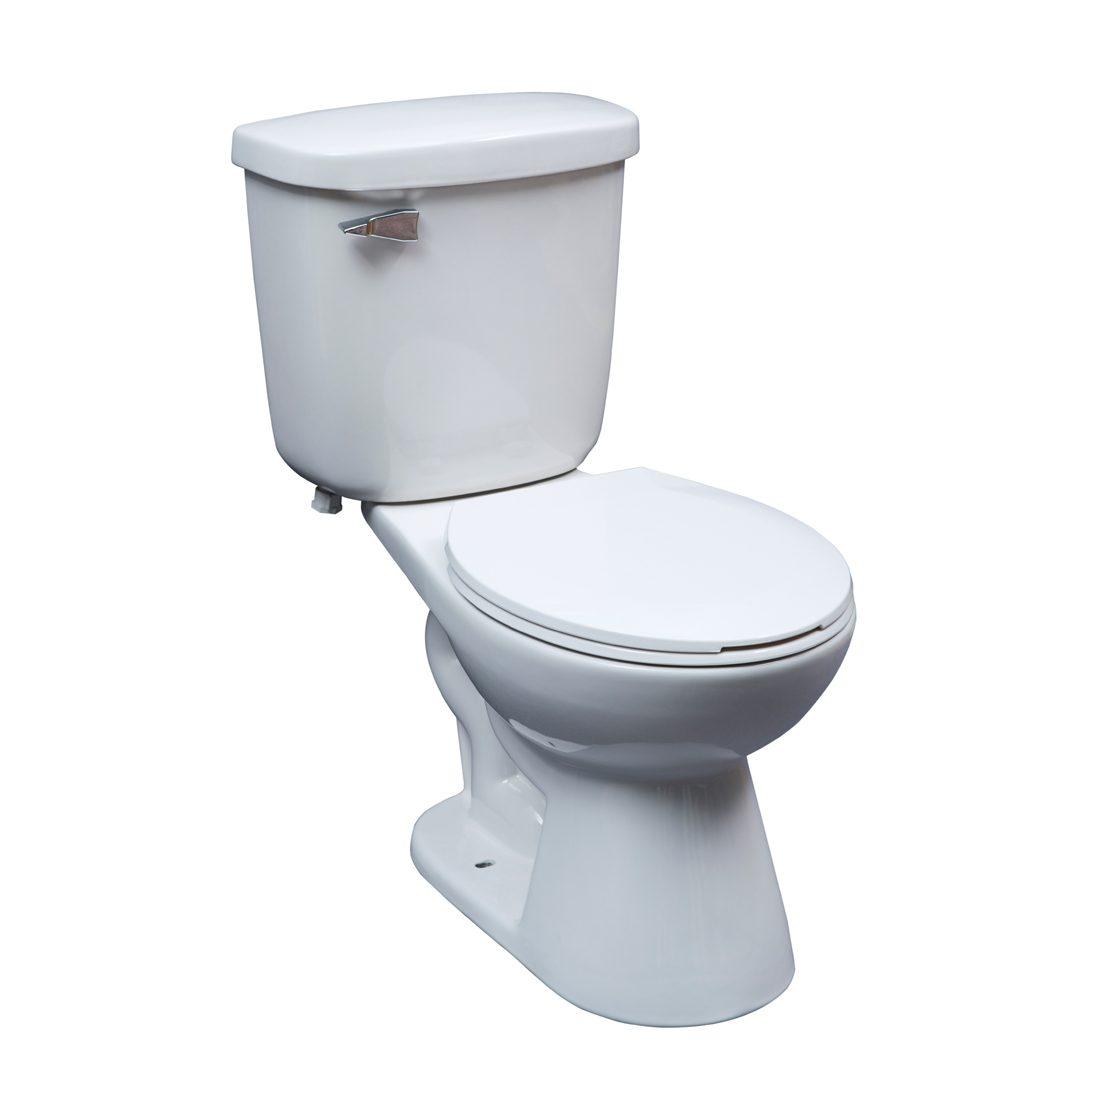 Saint John Toilet 15inch 6L White Front View